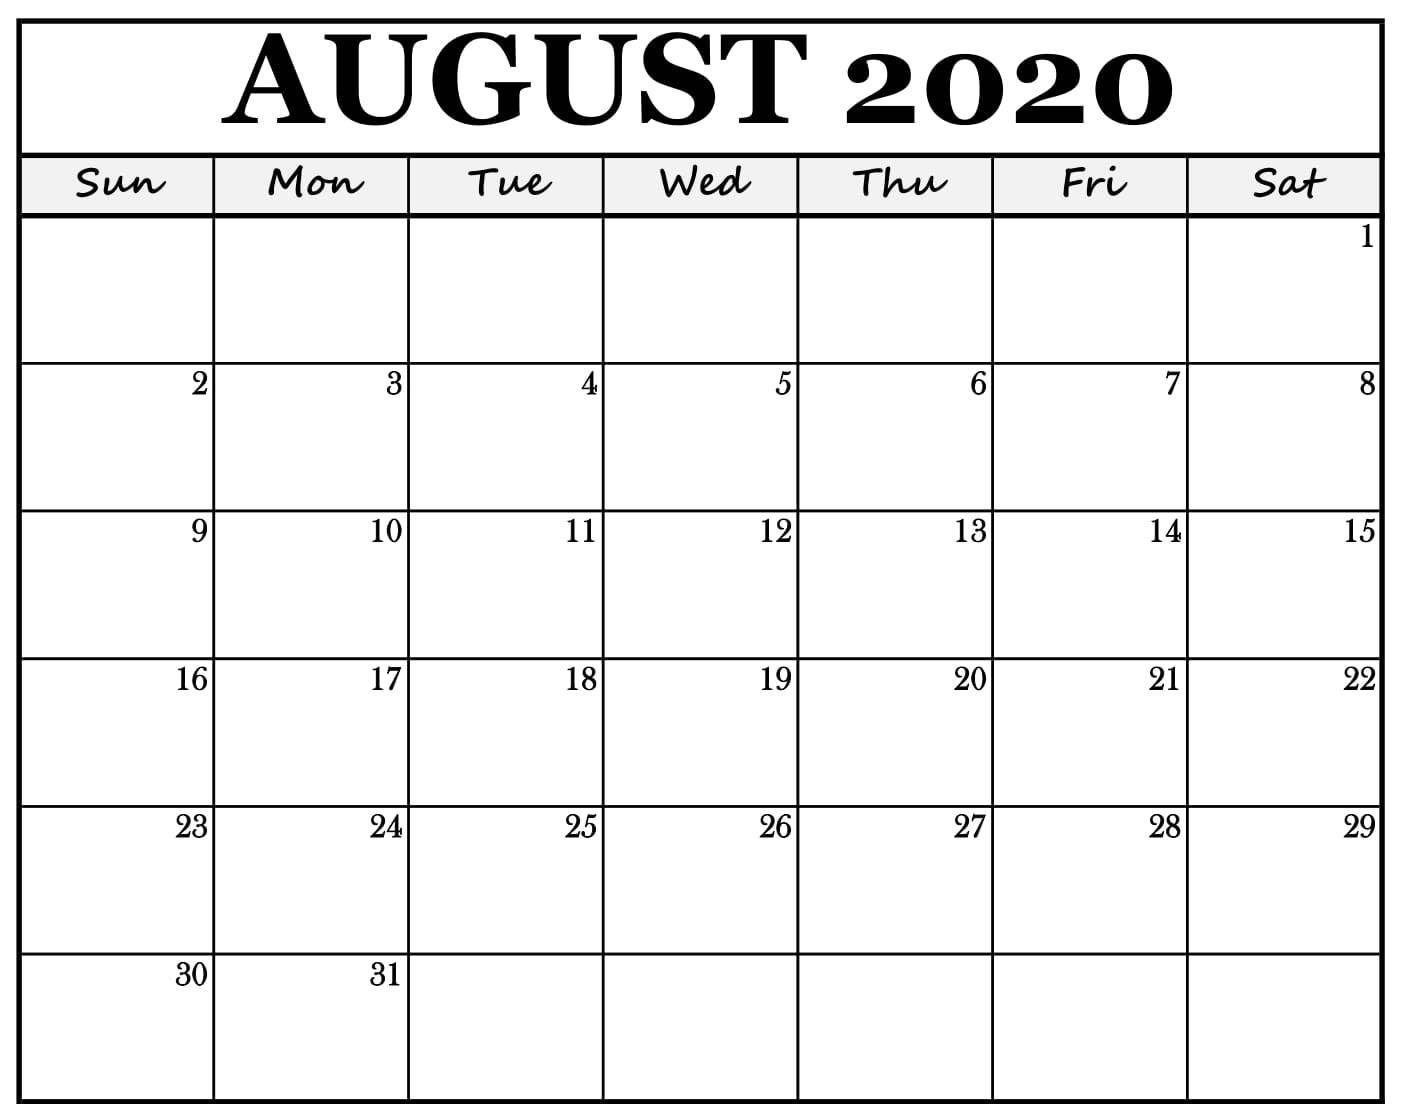 Fillable August 2020 Calendar Fillable Calendar Free Printable Calendar Templates Printable Calendar Template